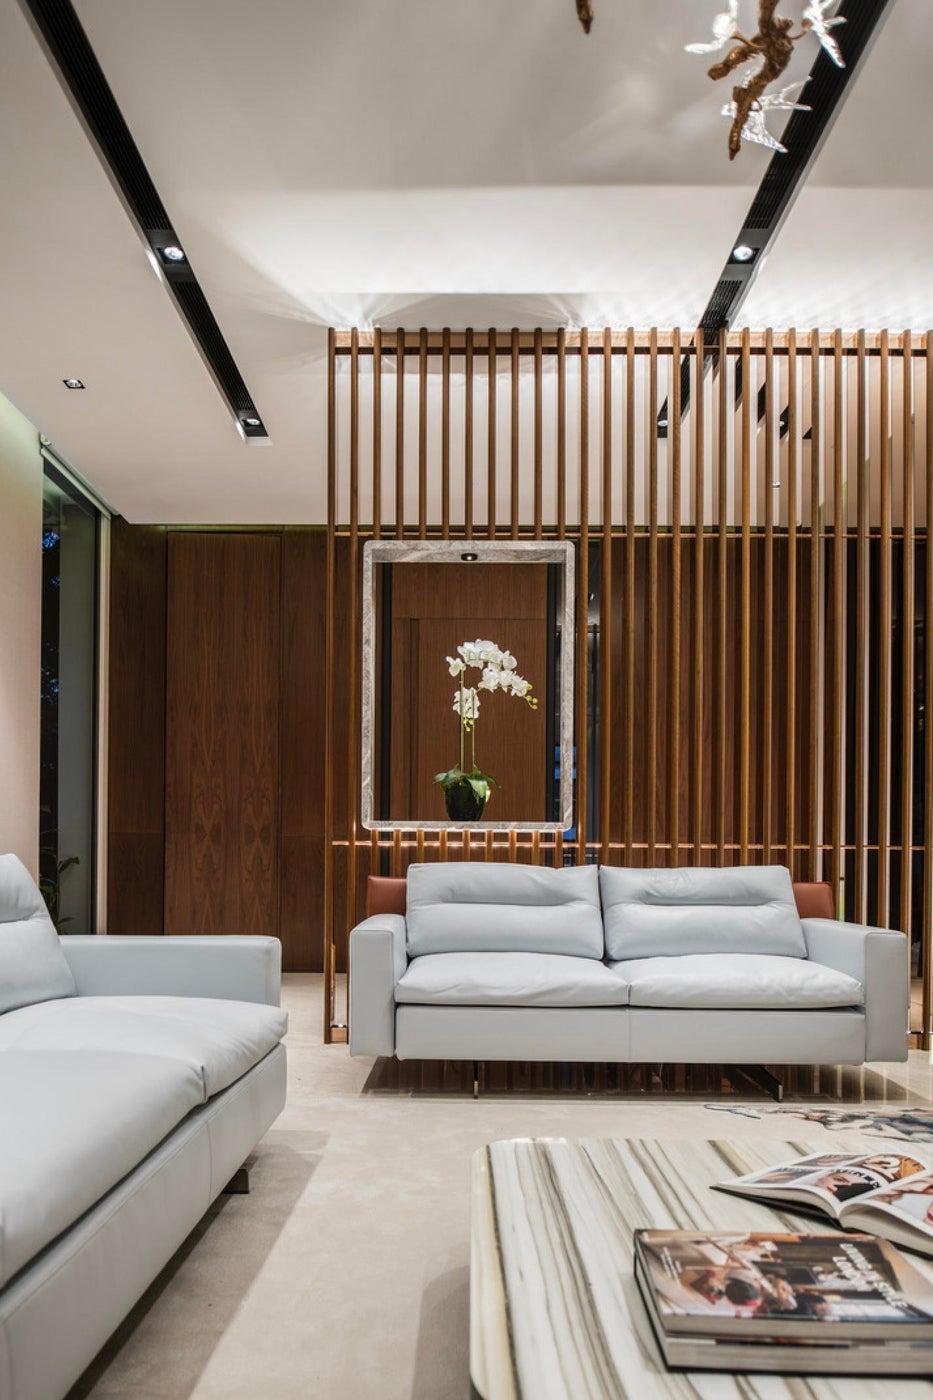 Millenial house, living room